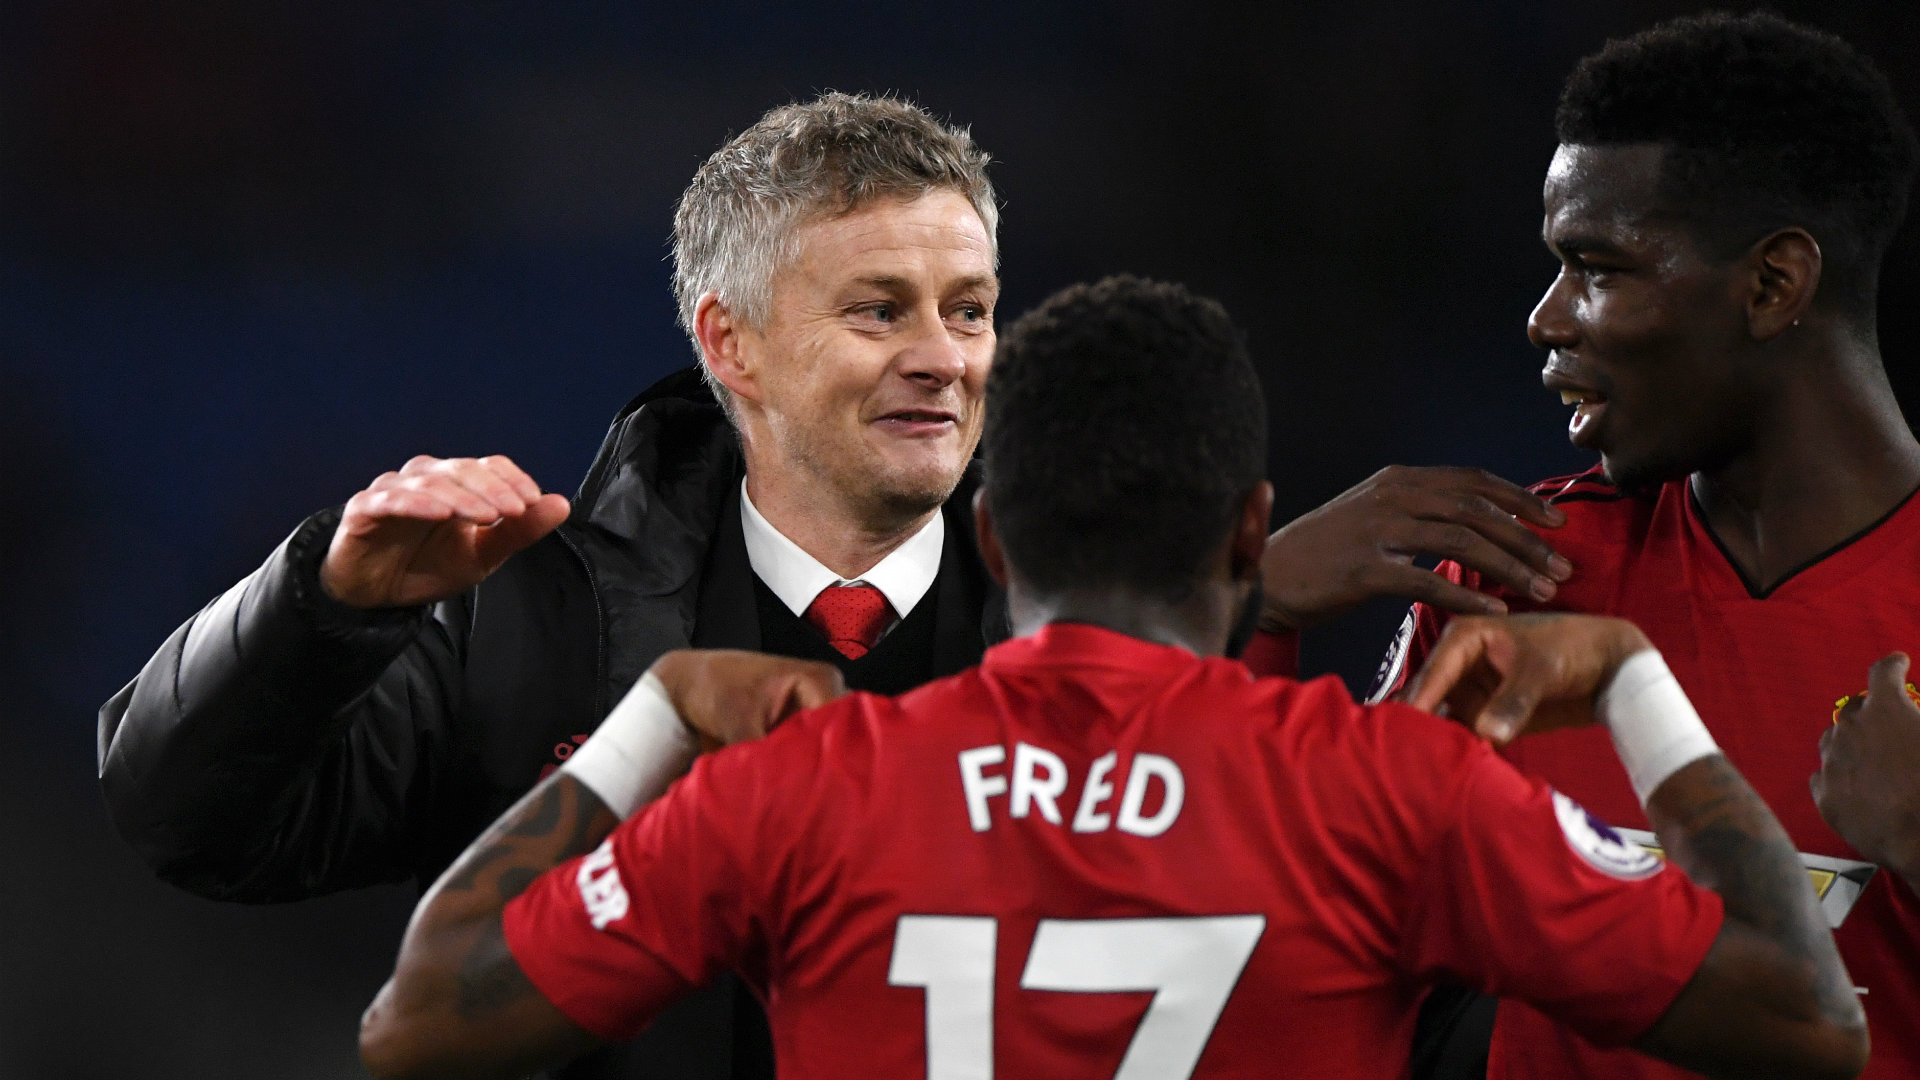 Baby Face Assasin Bawa Manchester United Menggila gilas Cardiff